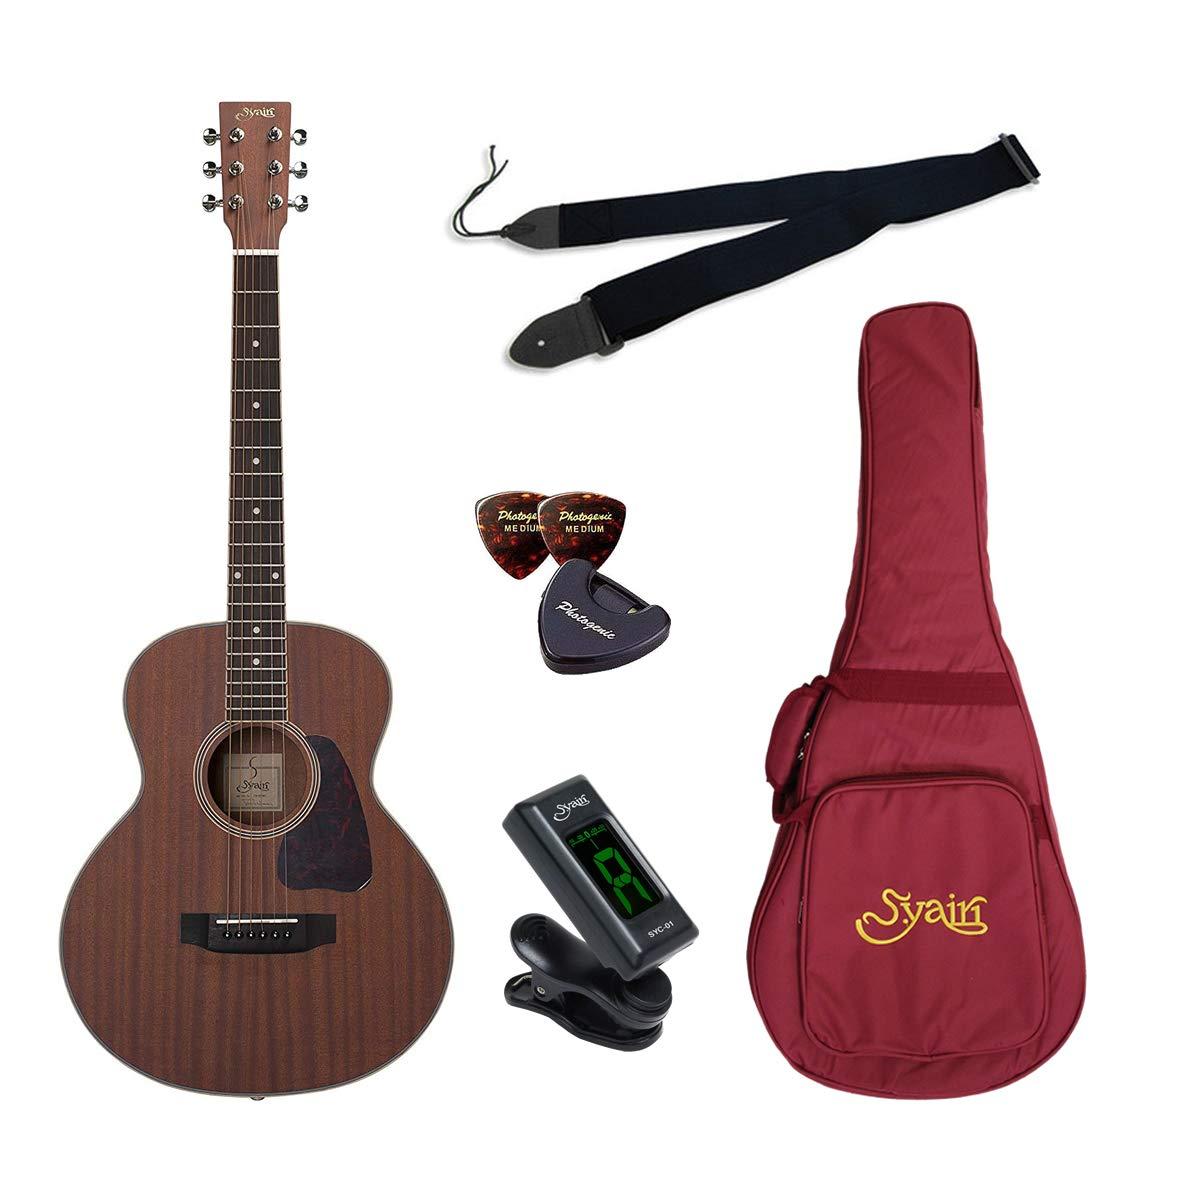 S.Yairi ヤイリ ミニギター Amazonオリジナル7点 クイックスタートセット YM-03/MH  マホガニー B07Q6QGBJM